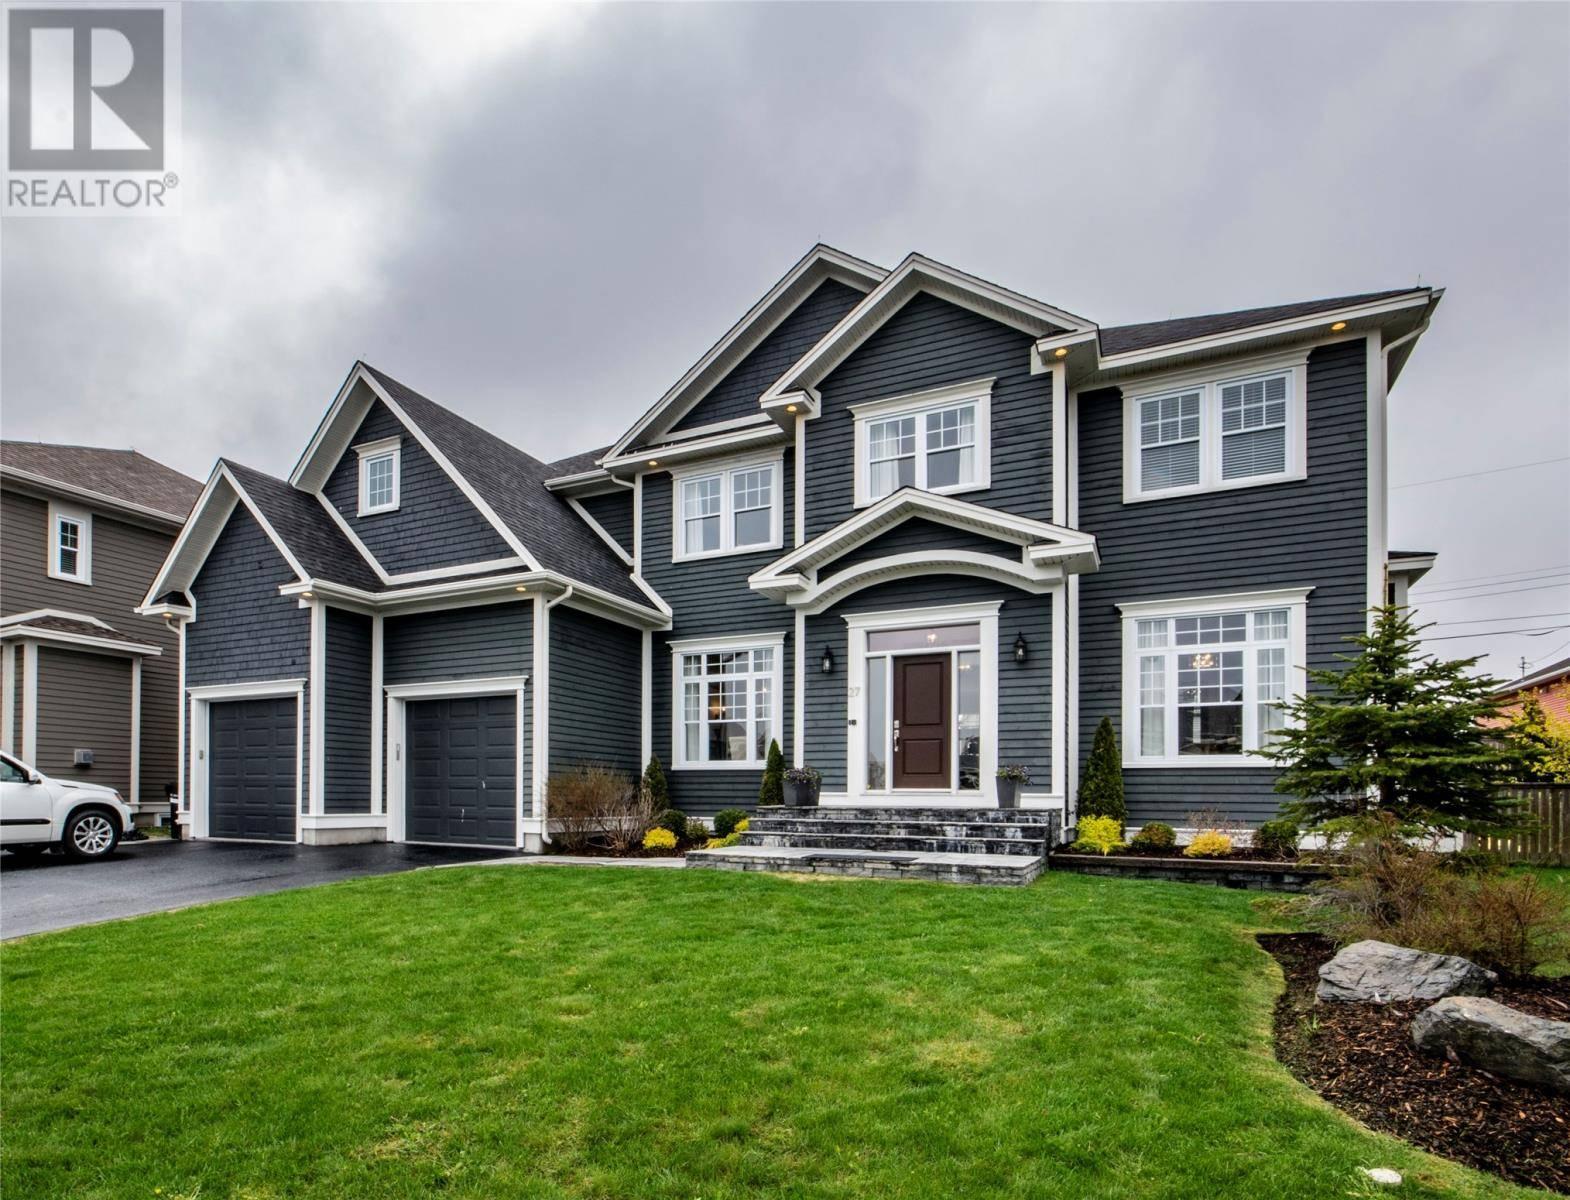 House for sale at 27 Stonebridge Pl St. John's Newfoundland - MLS: 1209210